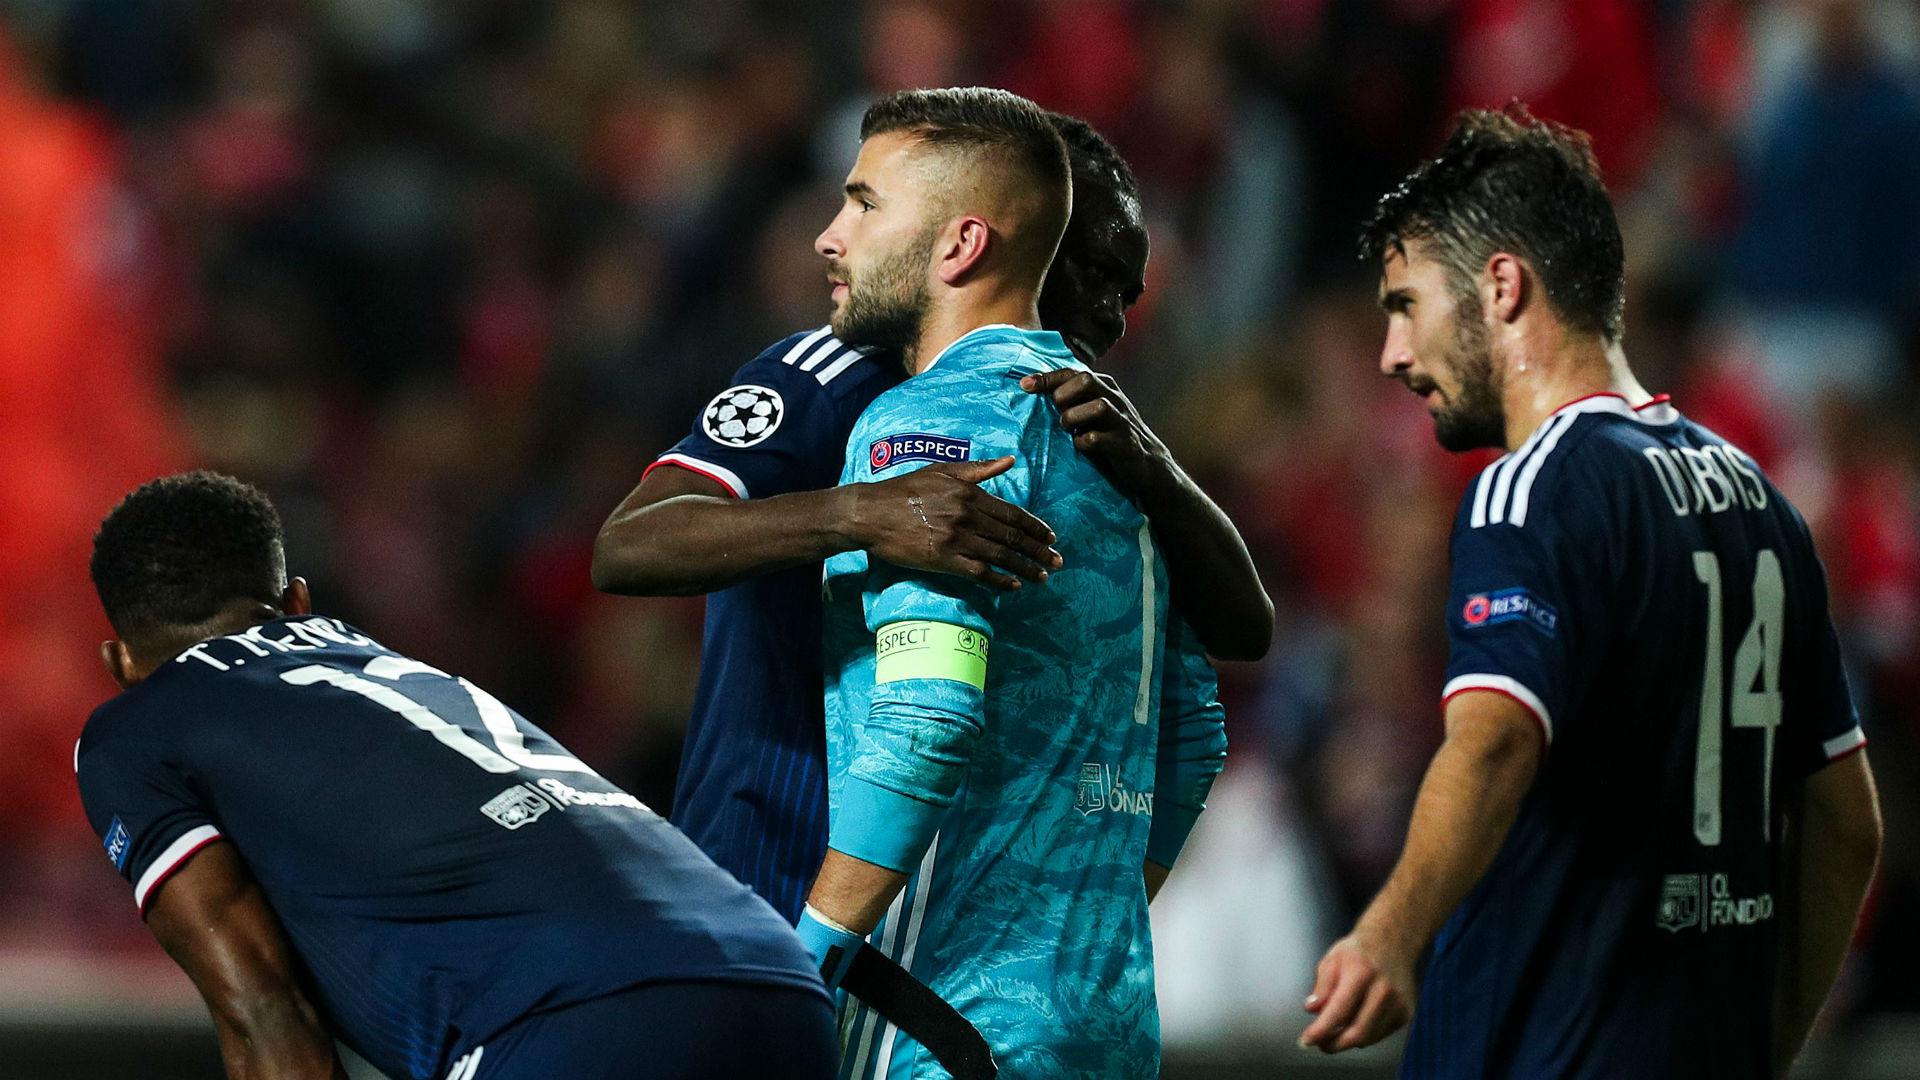 Benfica-OL (2-1), Lopes plombe Lyon